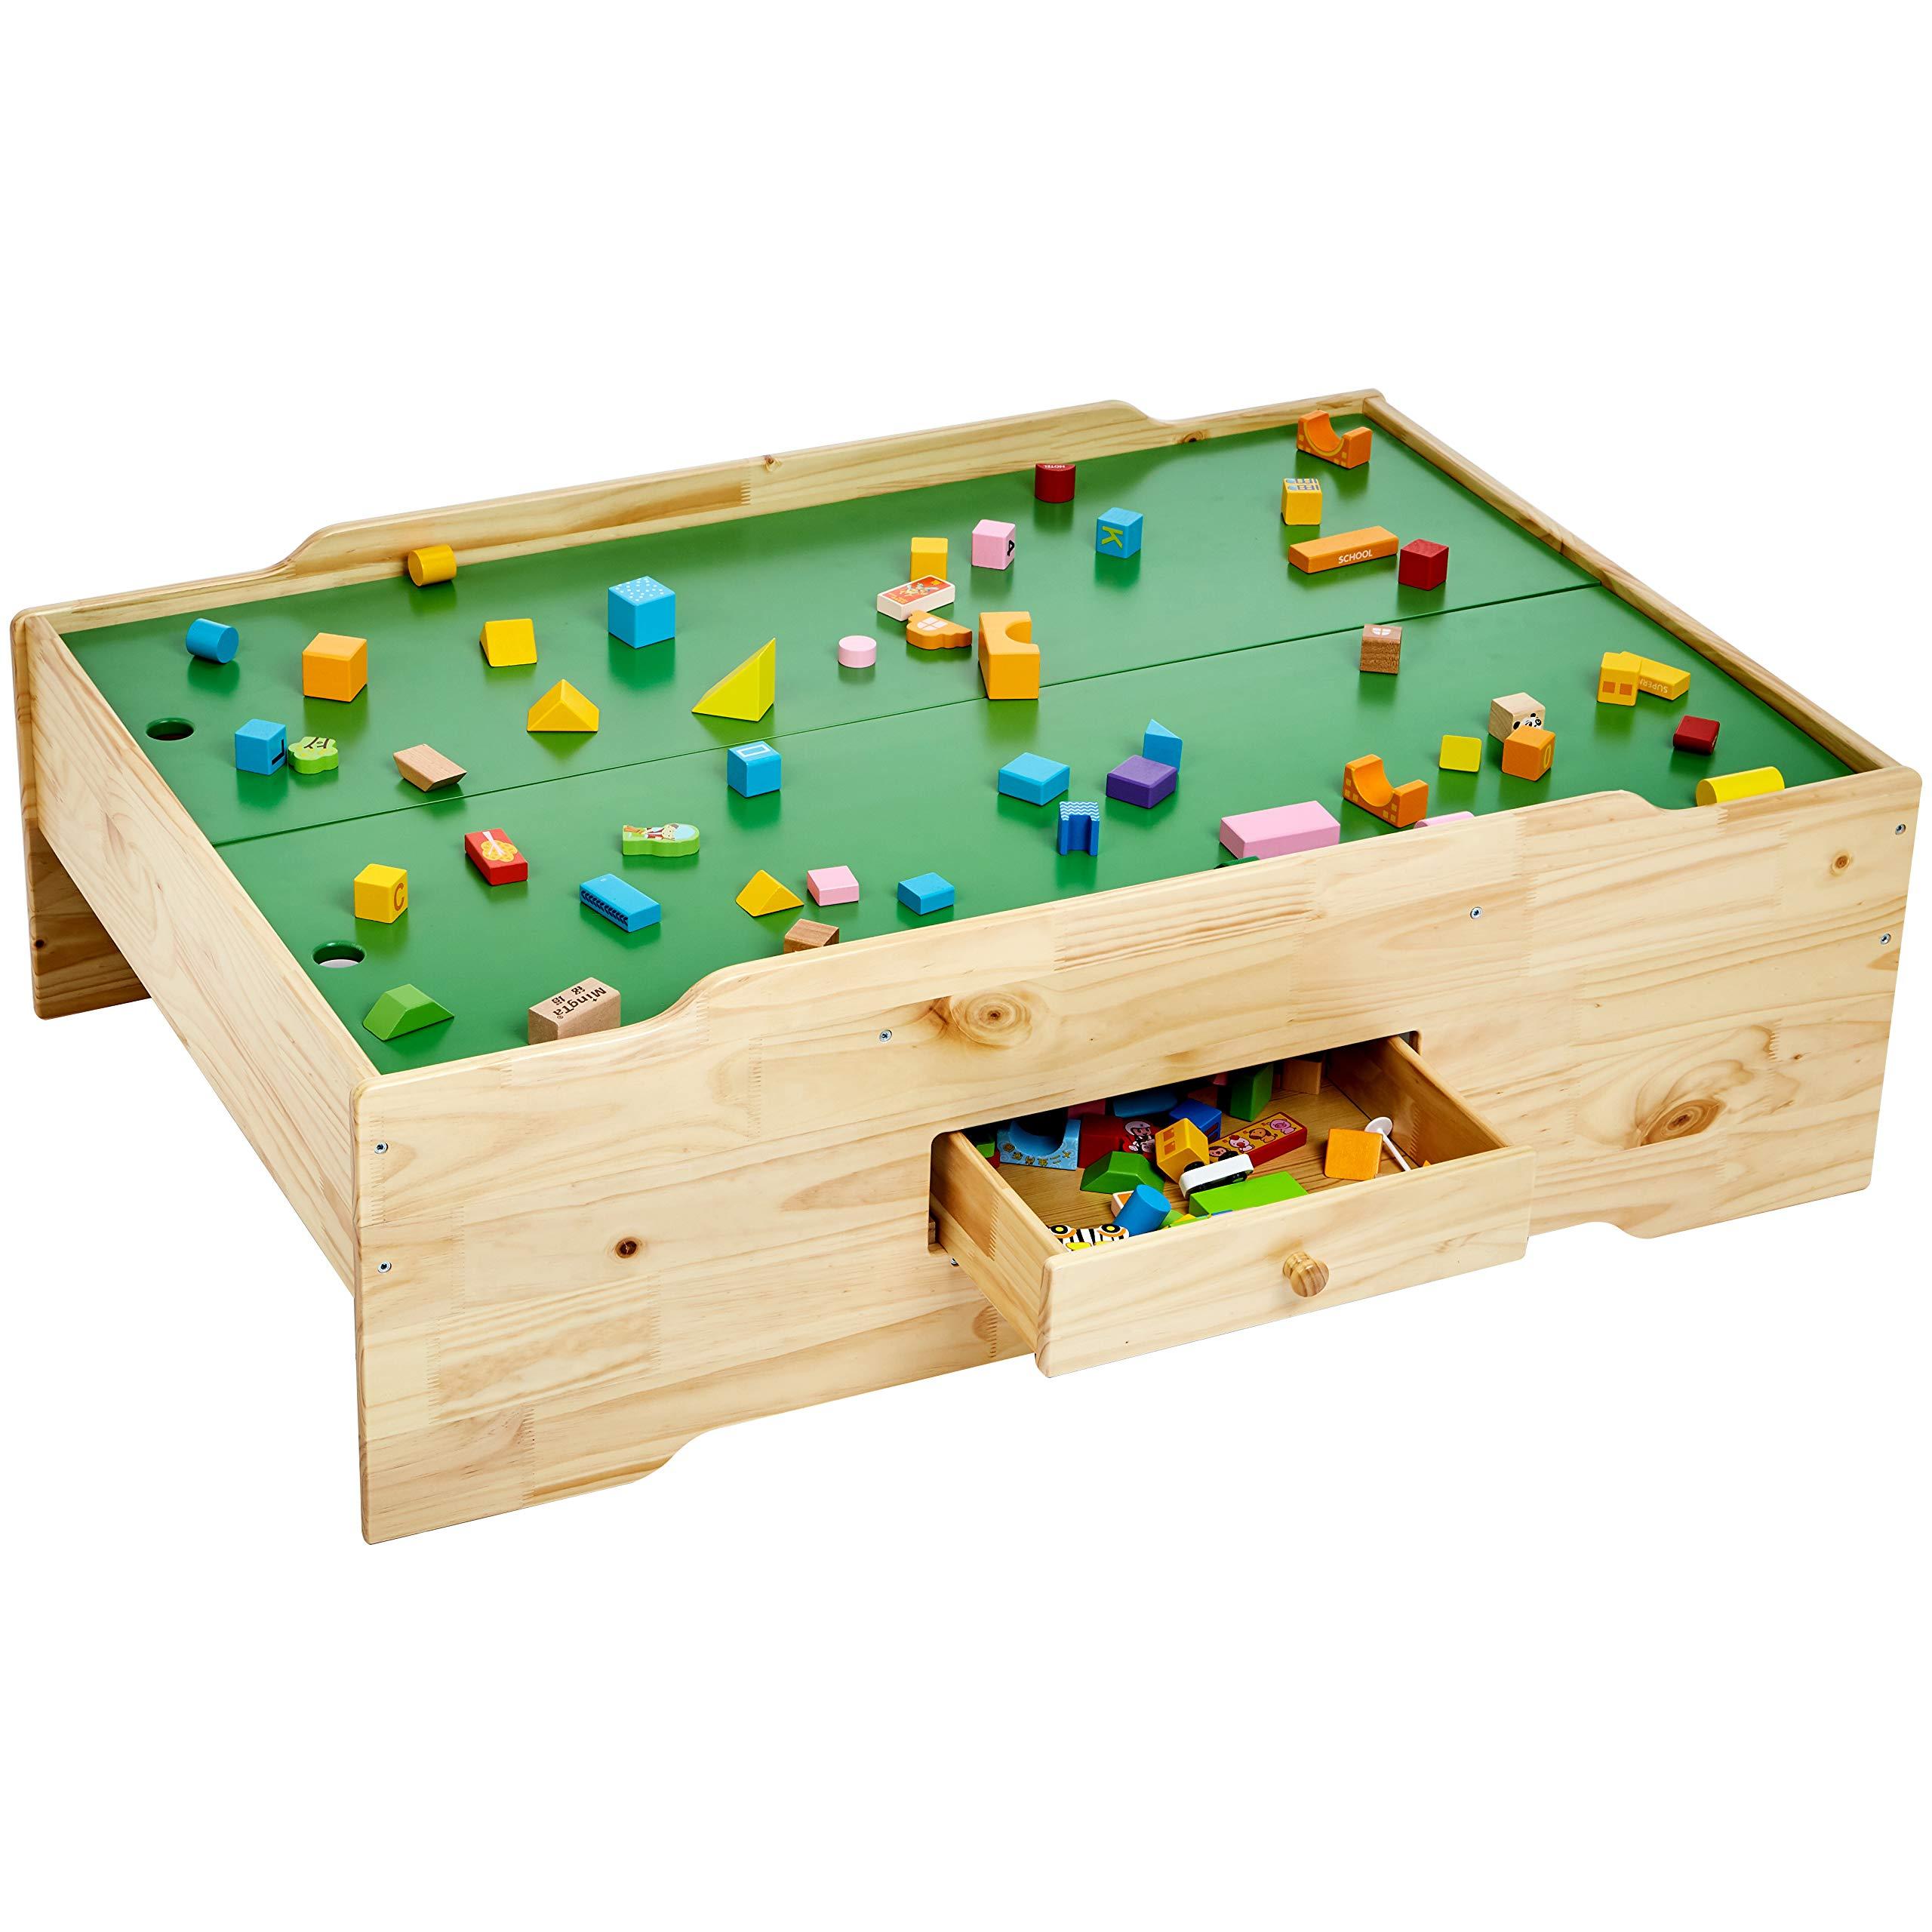 AmazonBasics Wooden Multi-Activity Play Table, Natural by AmazonBasics (Image #6)